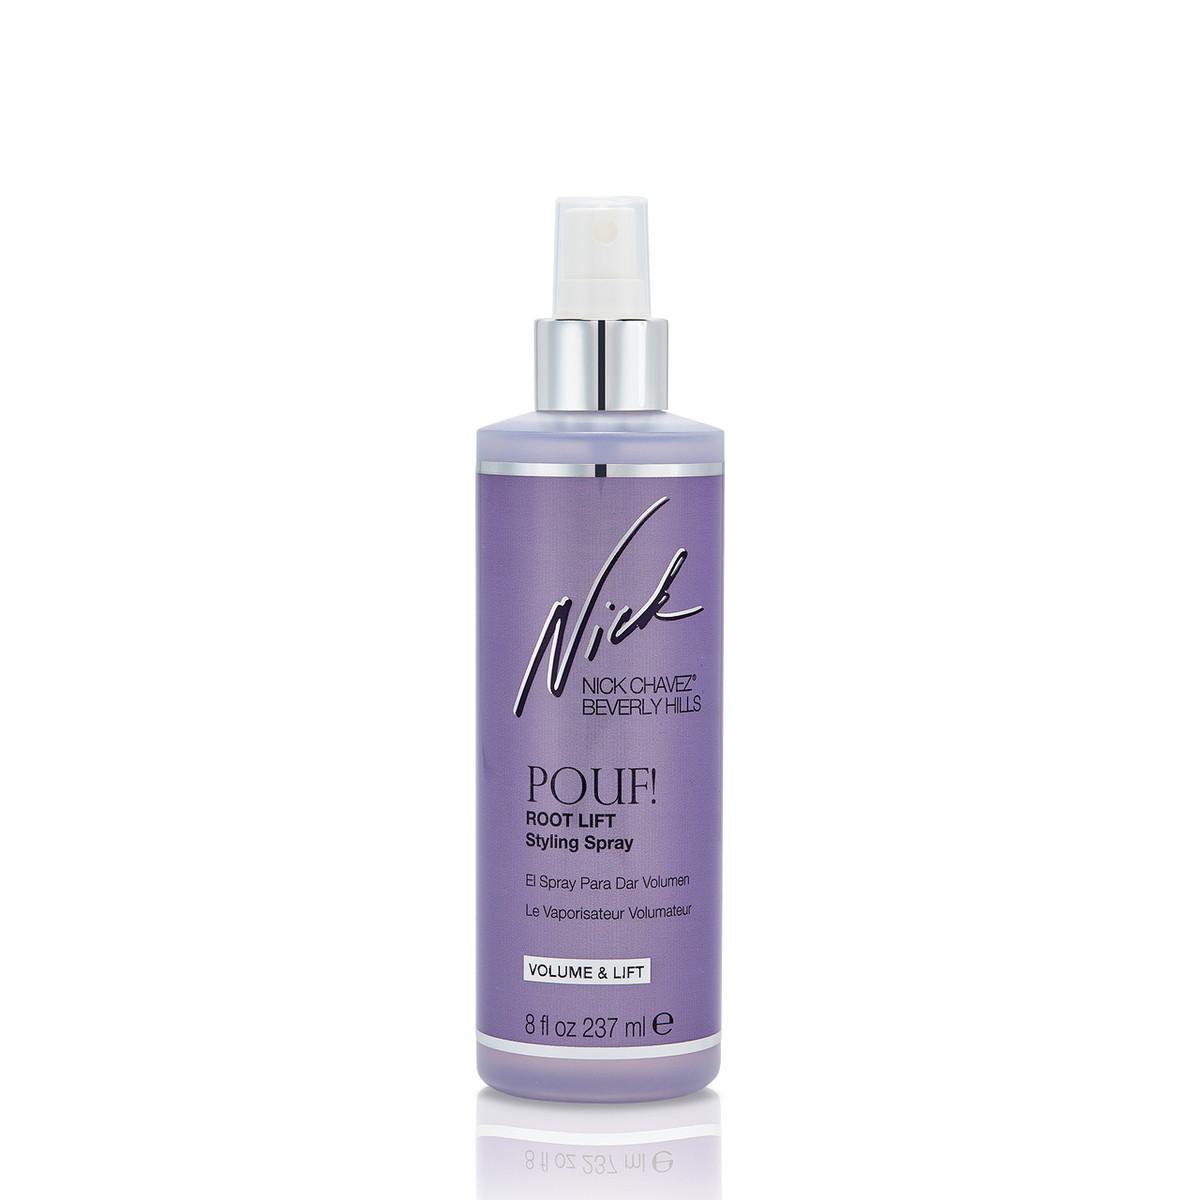 Pouf! Root Lift Spray